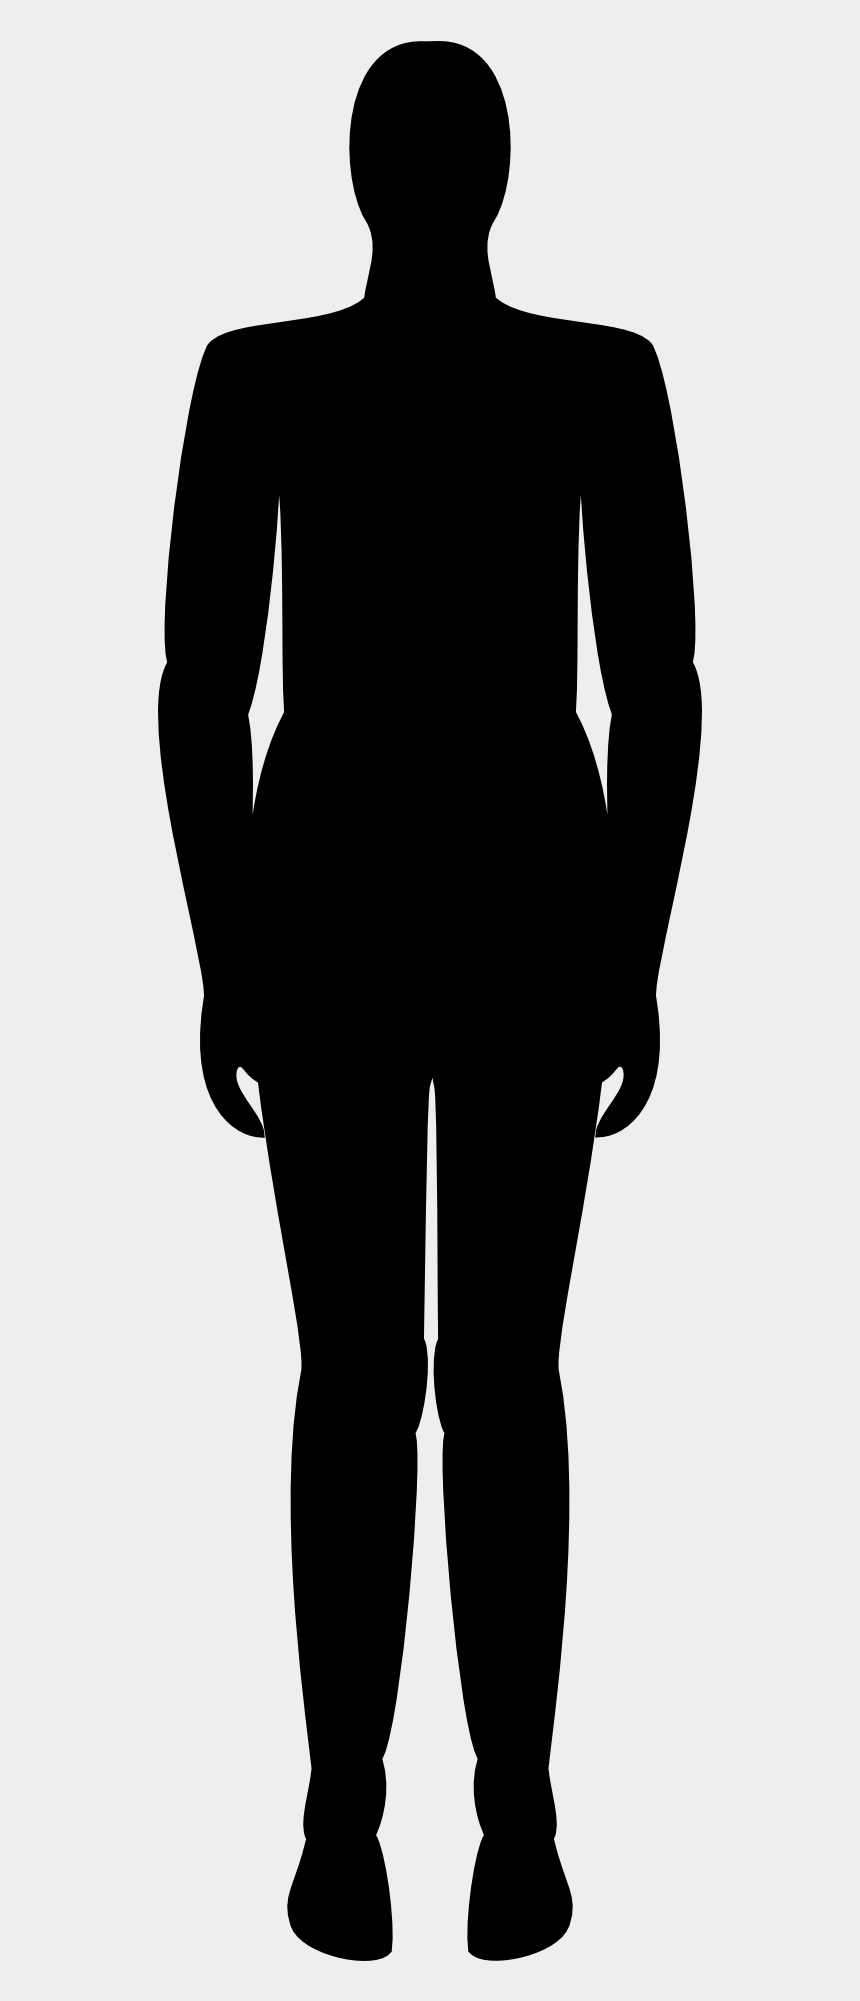 handsome man standing clipart, Cartoons - Man Clipart Silhouette